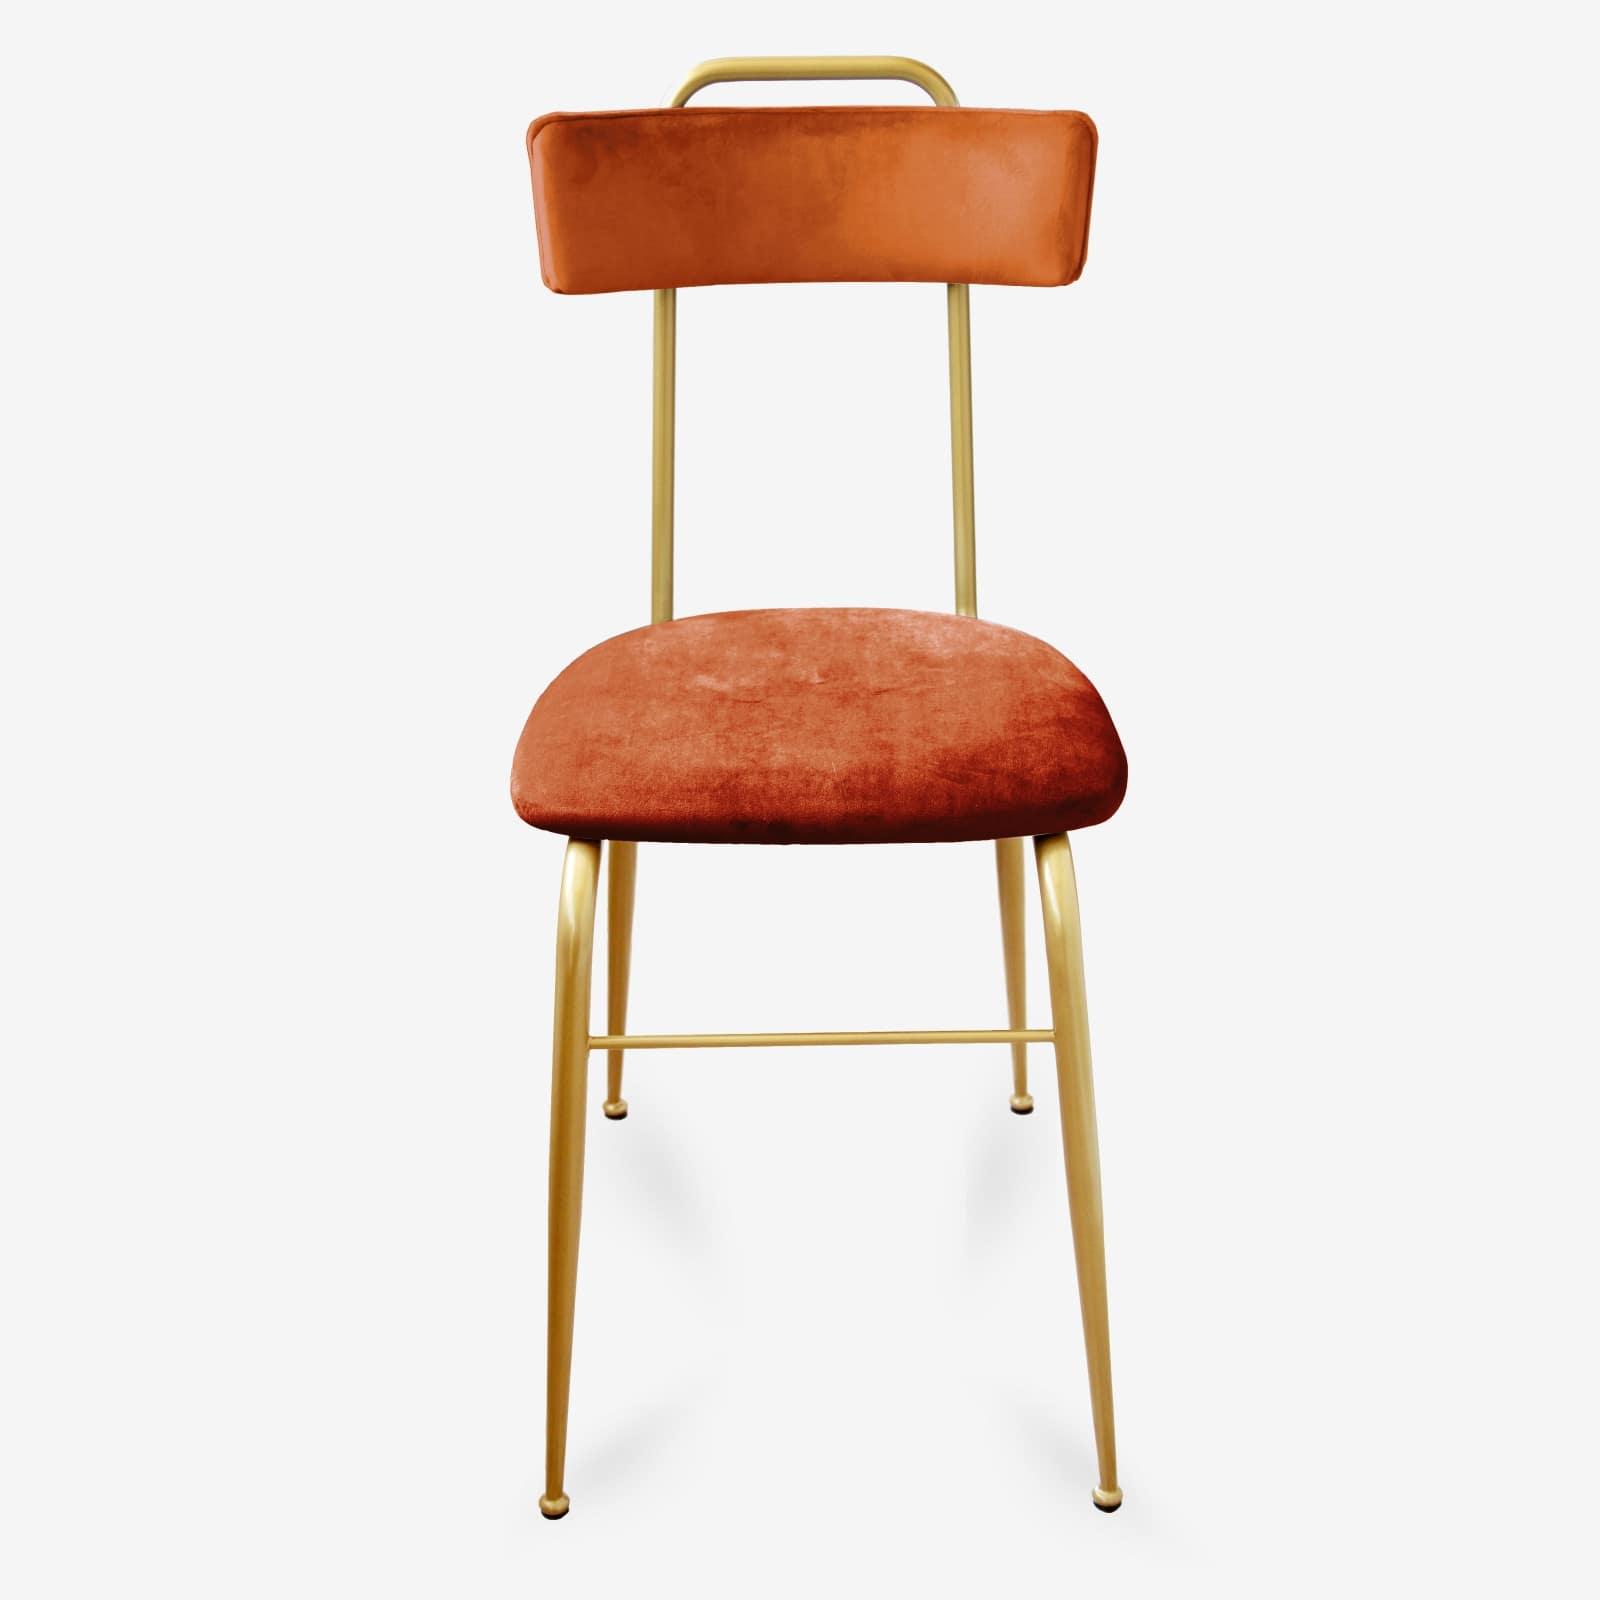 Sedia in Velluto arancio stile Vintage con gambe in Metallo oro liscio CLOE